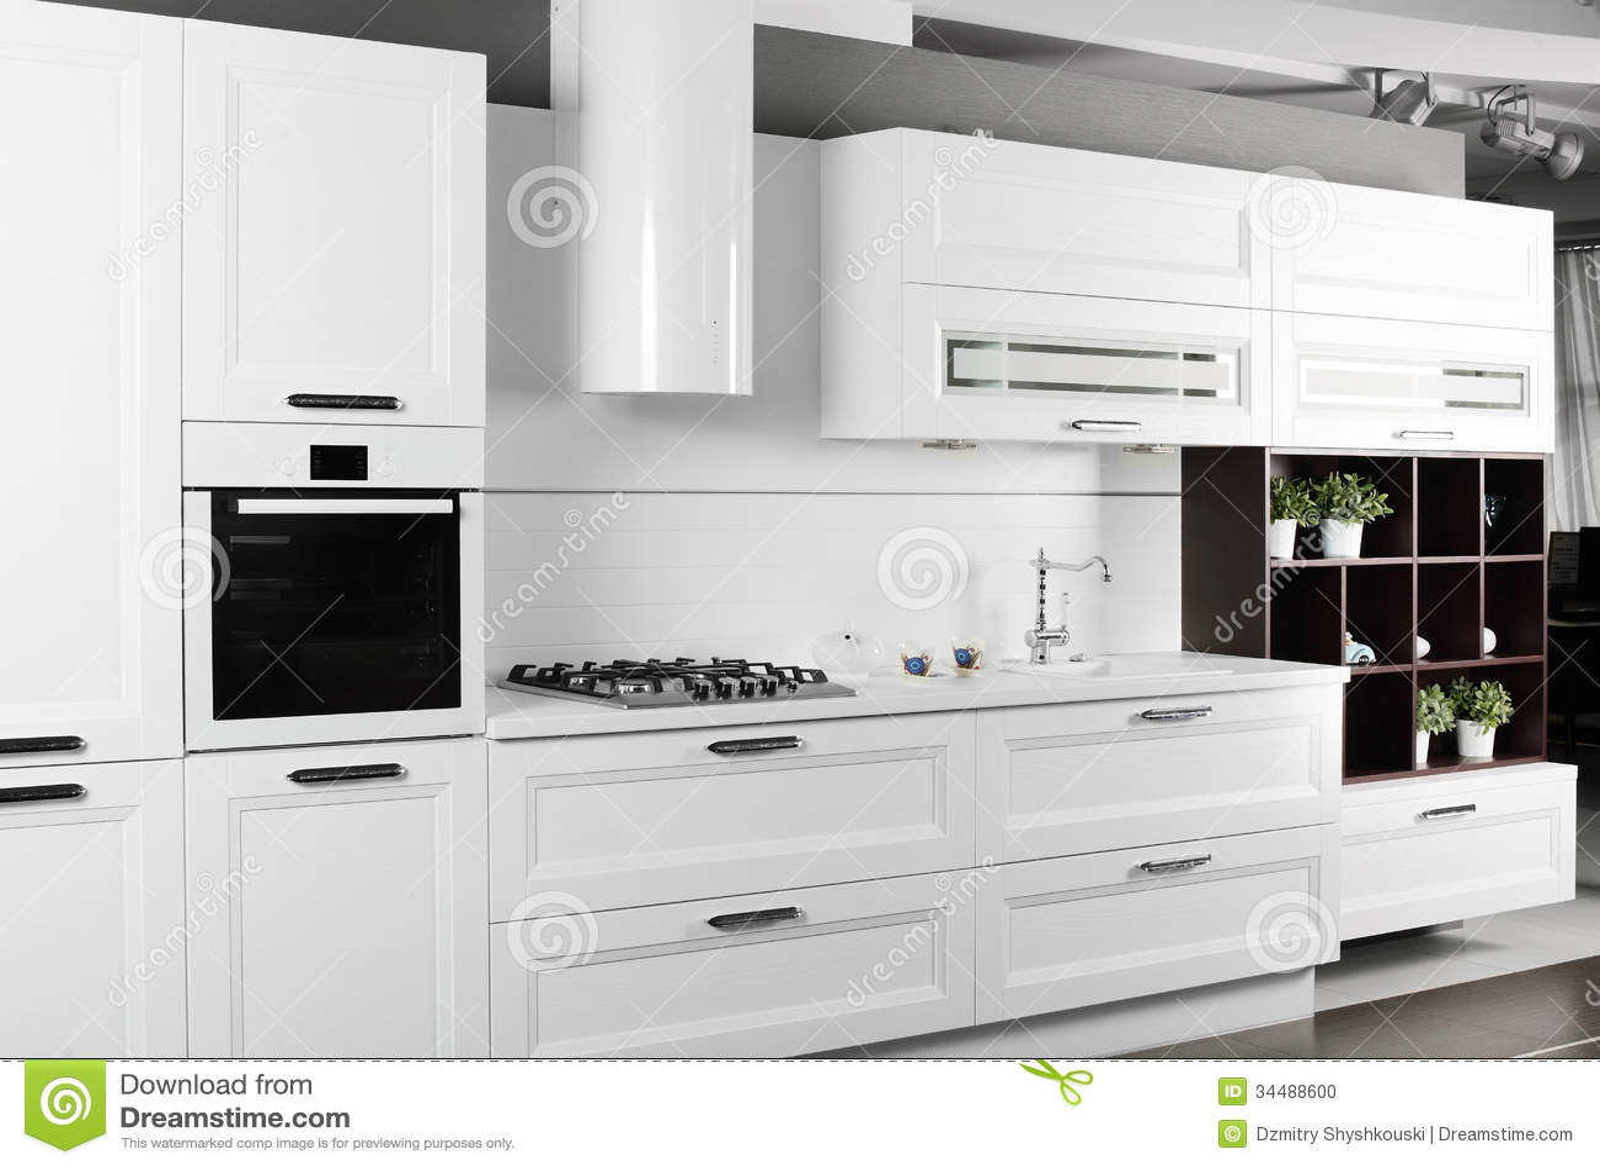 Bright Brand New European Kitchen Stock Photo   Image Of Indoors, Kitchen:  34488600